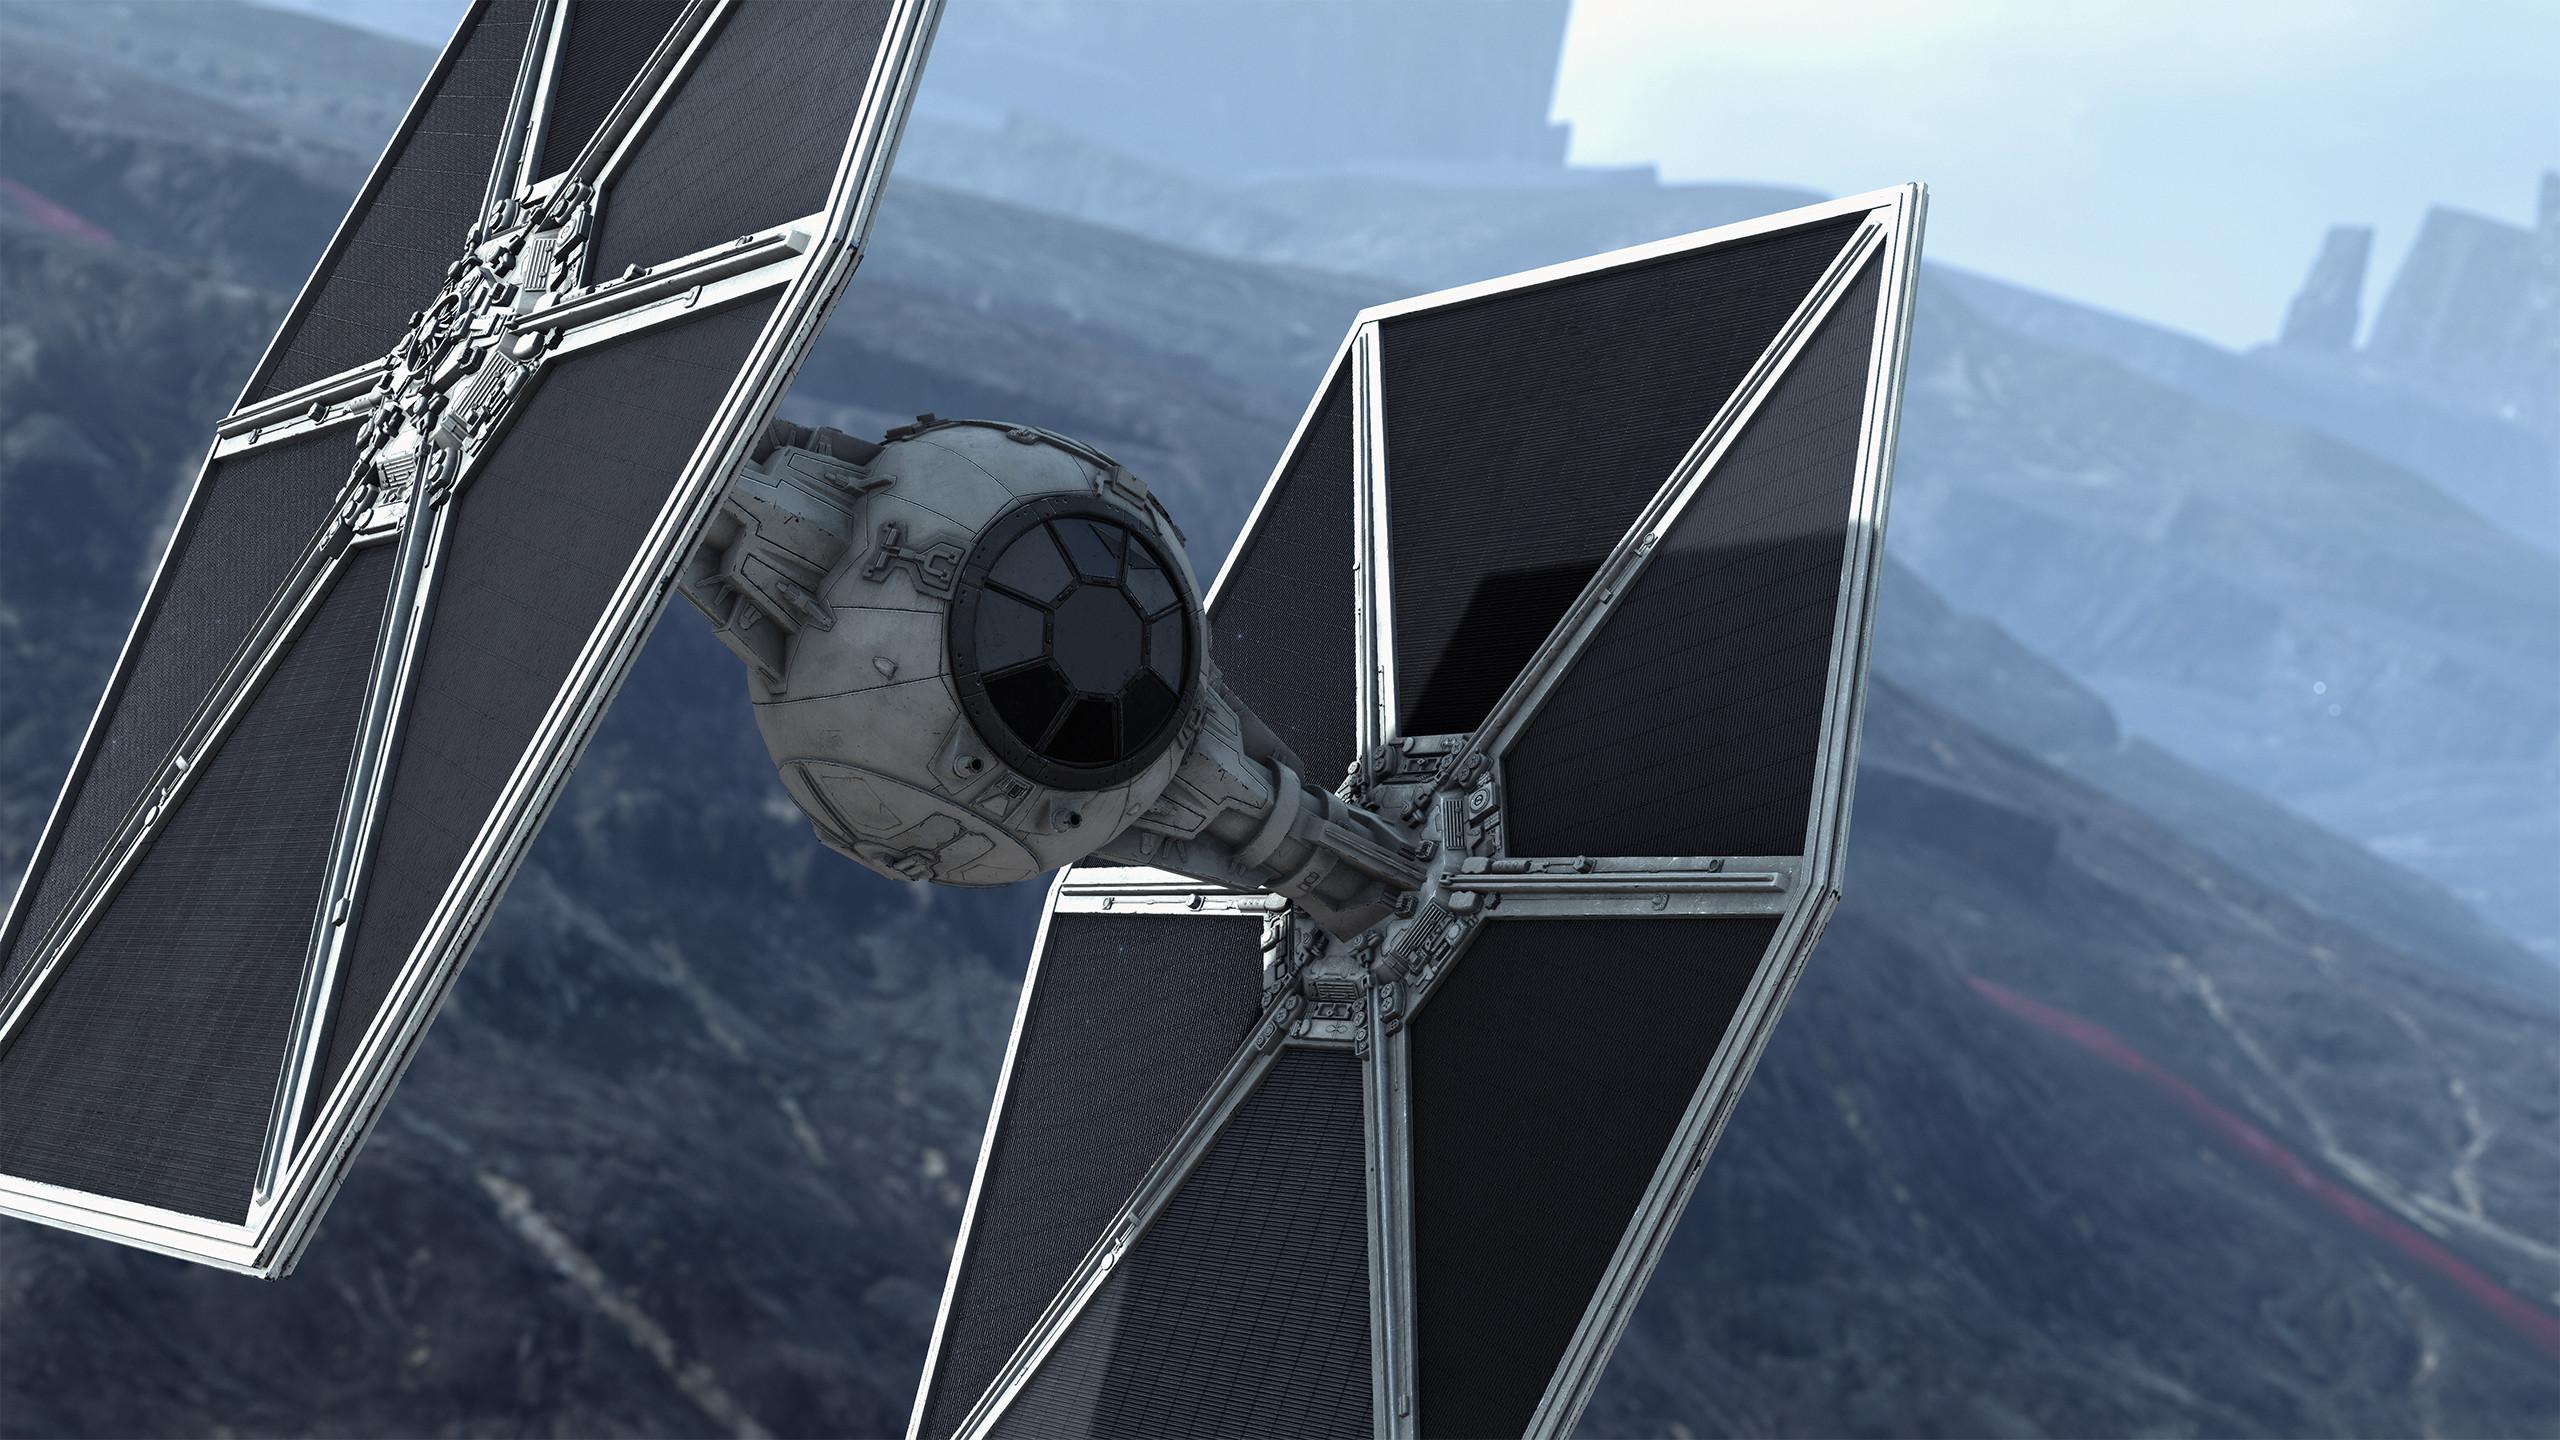 Star Wars Battlefront TIE Fighter Wallpapers HD / Desktop and Mobile  Backgrounds